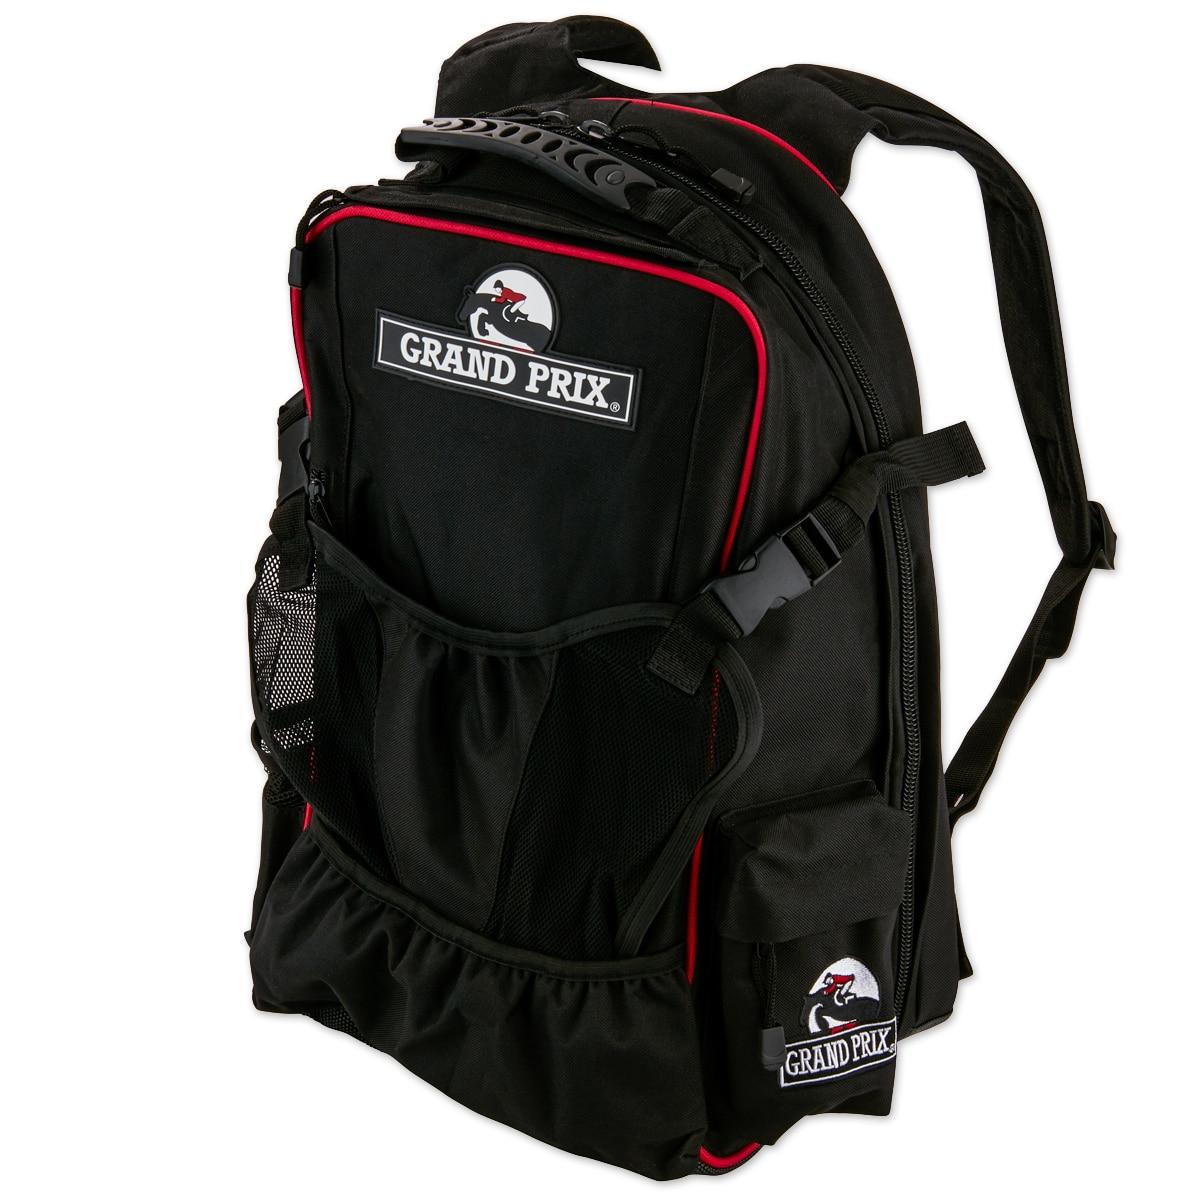 Grand Prix Rider Back Pack d9789f3646